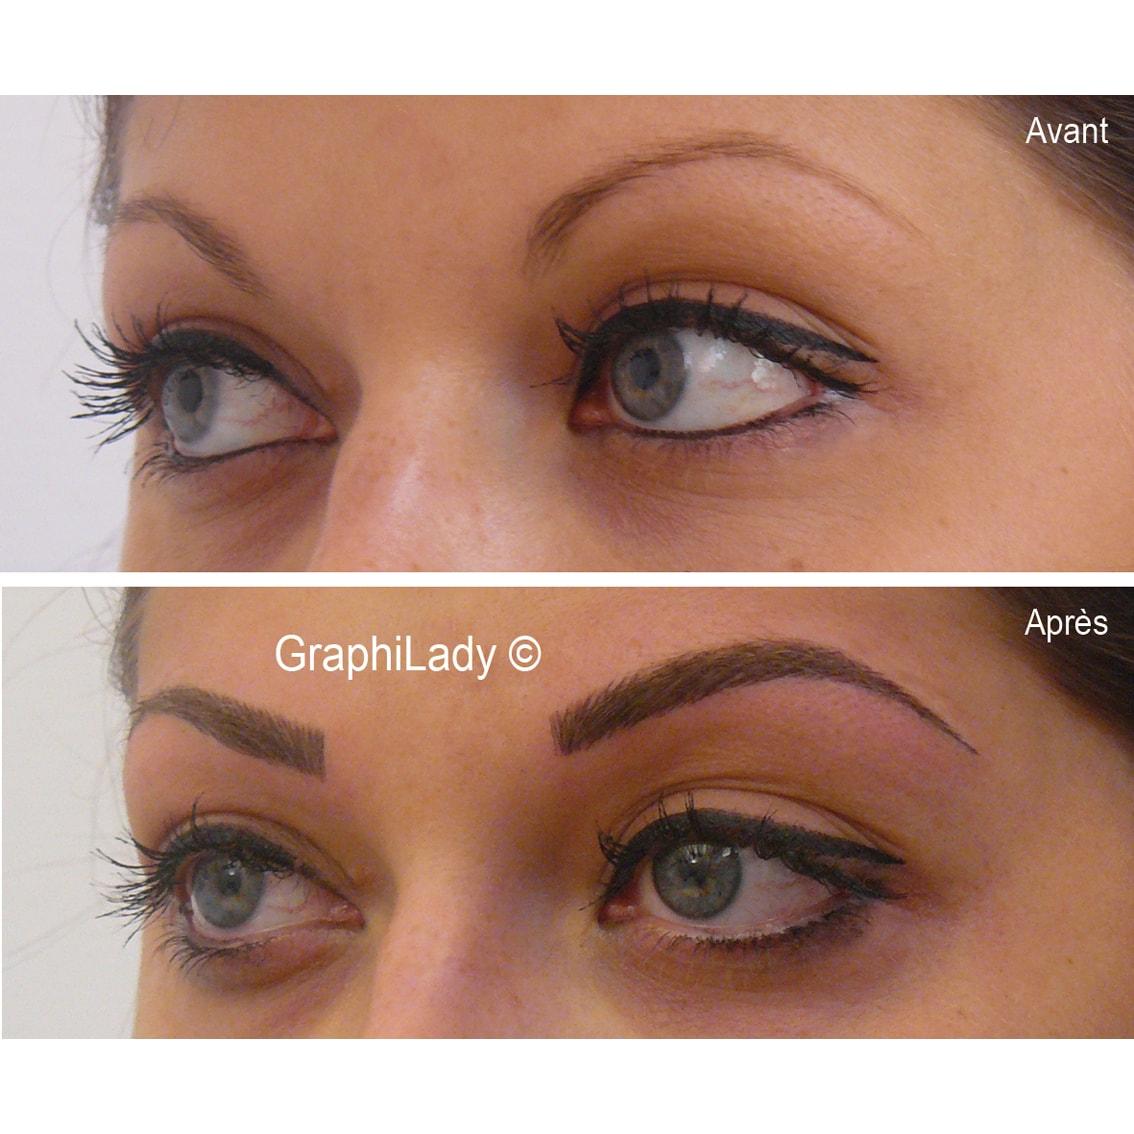 maquillage permanent sourcils 13 graphilady